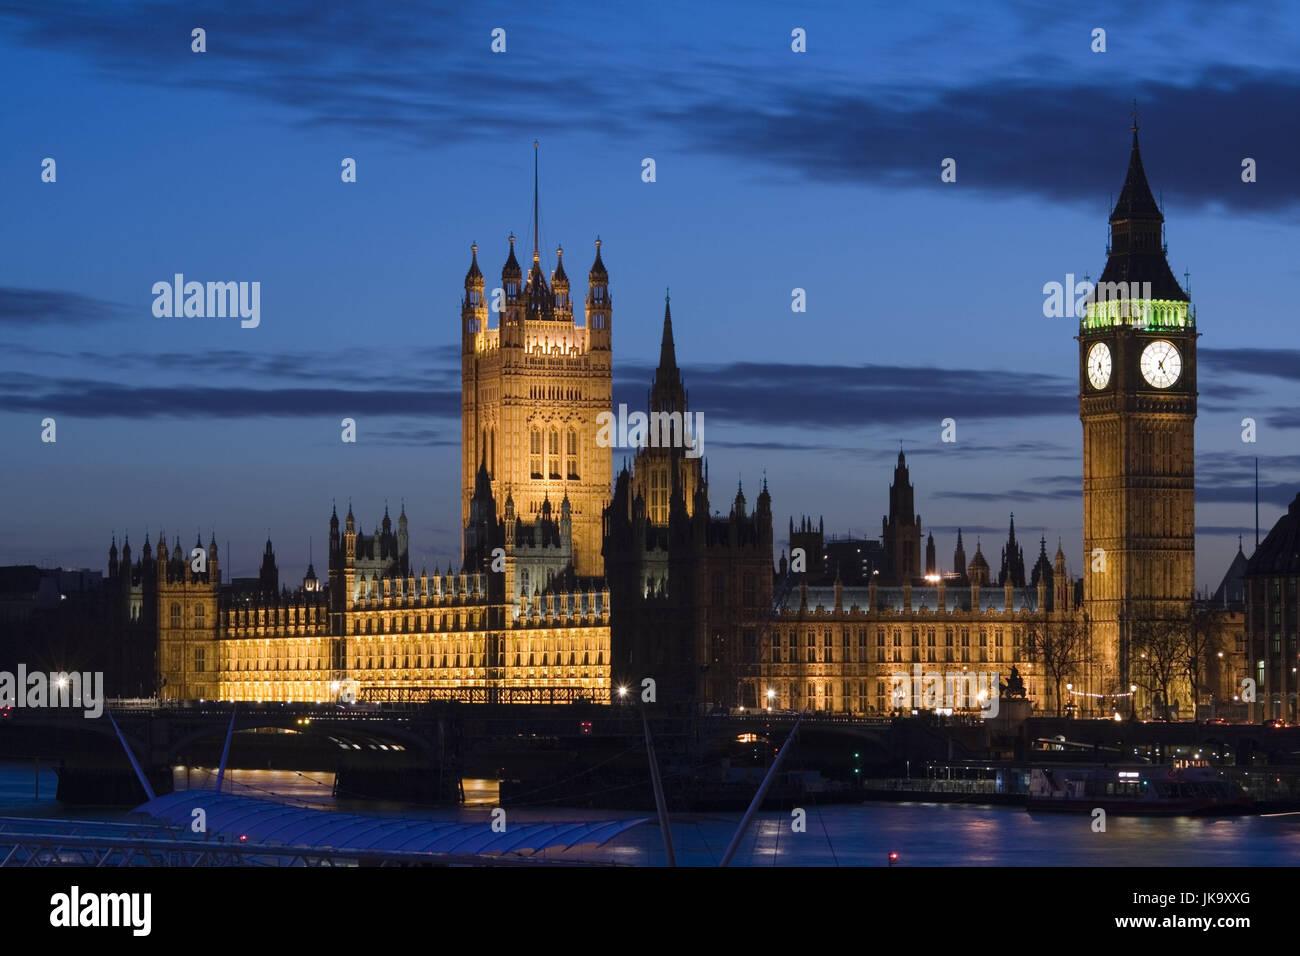 Großbritannien, England, London, Themse, Houses of Parliament, Big Ben, Beleuchtet, Abend Europa, Stadt, Hauptstadtkulturfonds, Stockbild